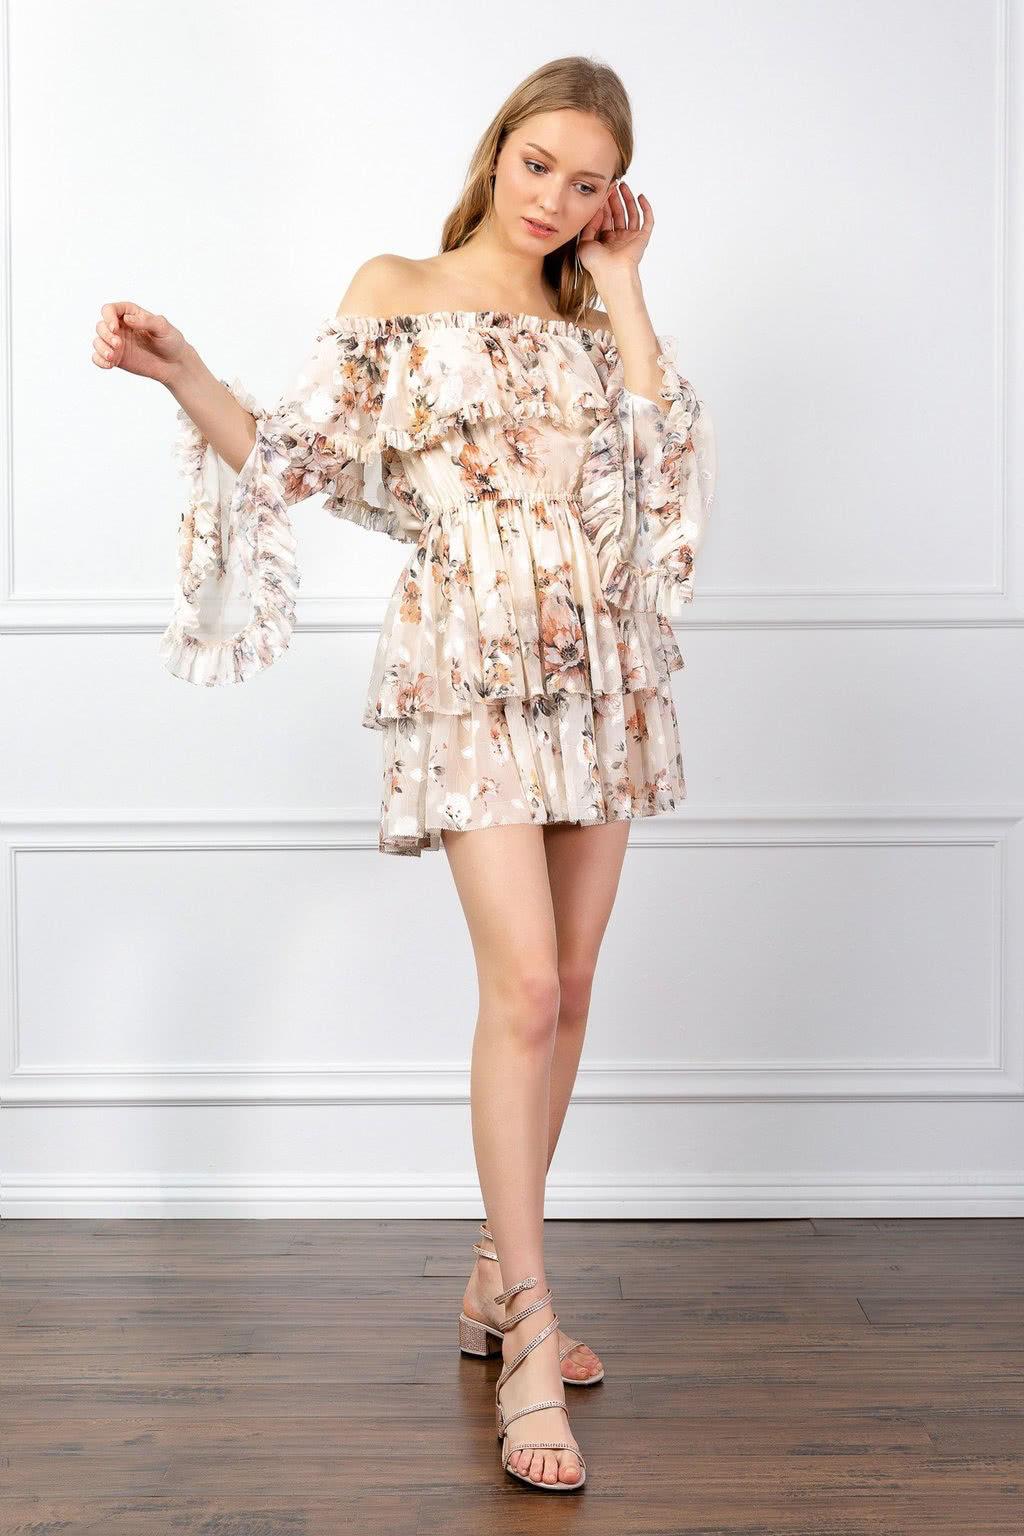 J.ING innocent dress summer 2019 women - Luxe Digital